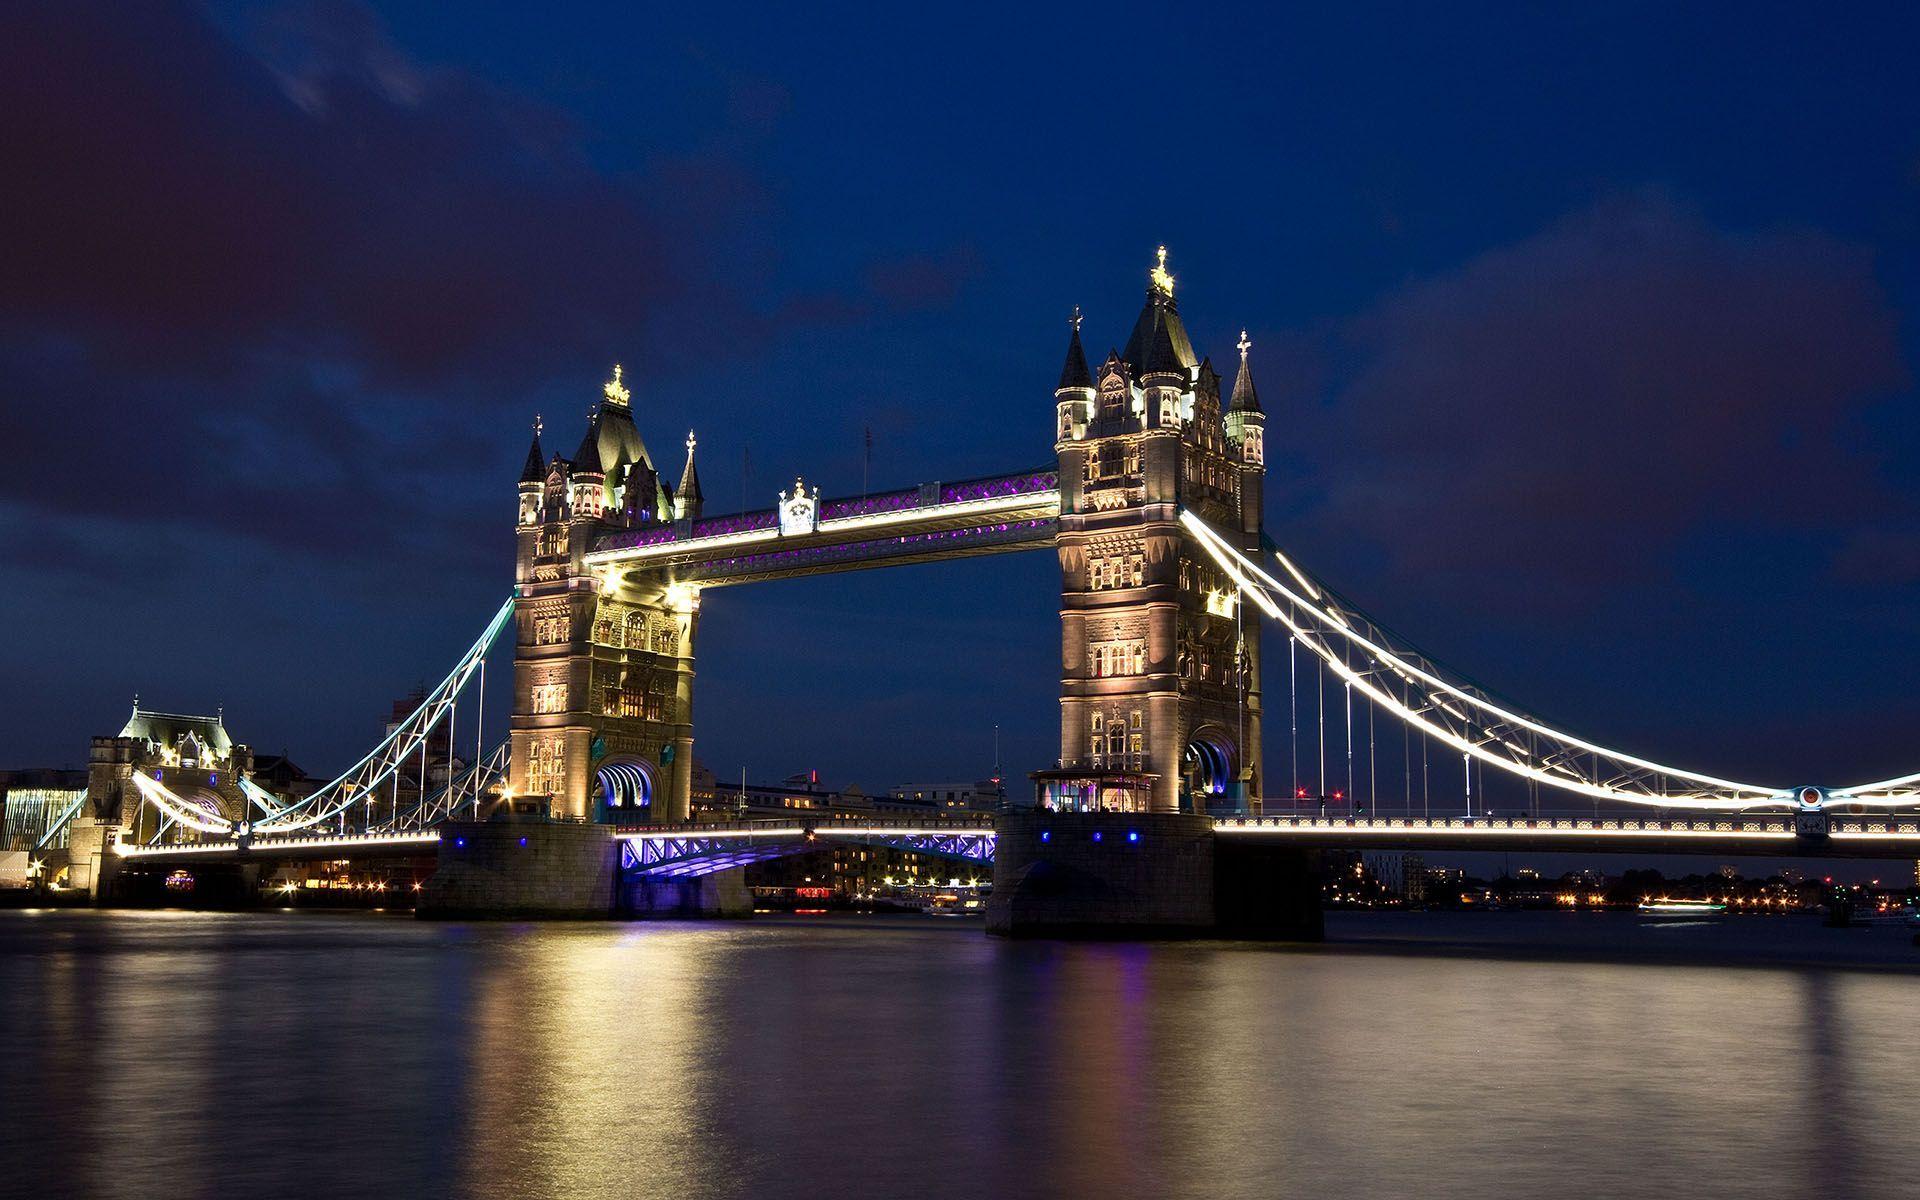 Tower Bridge London wallpaper 17887 1920x1200